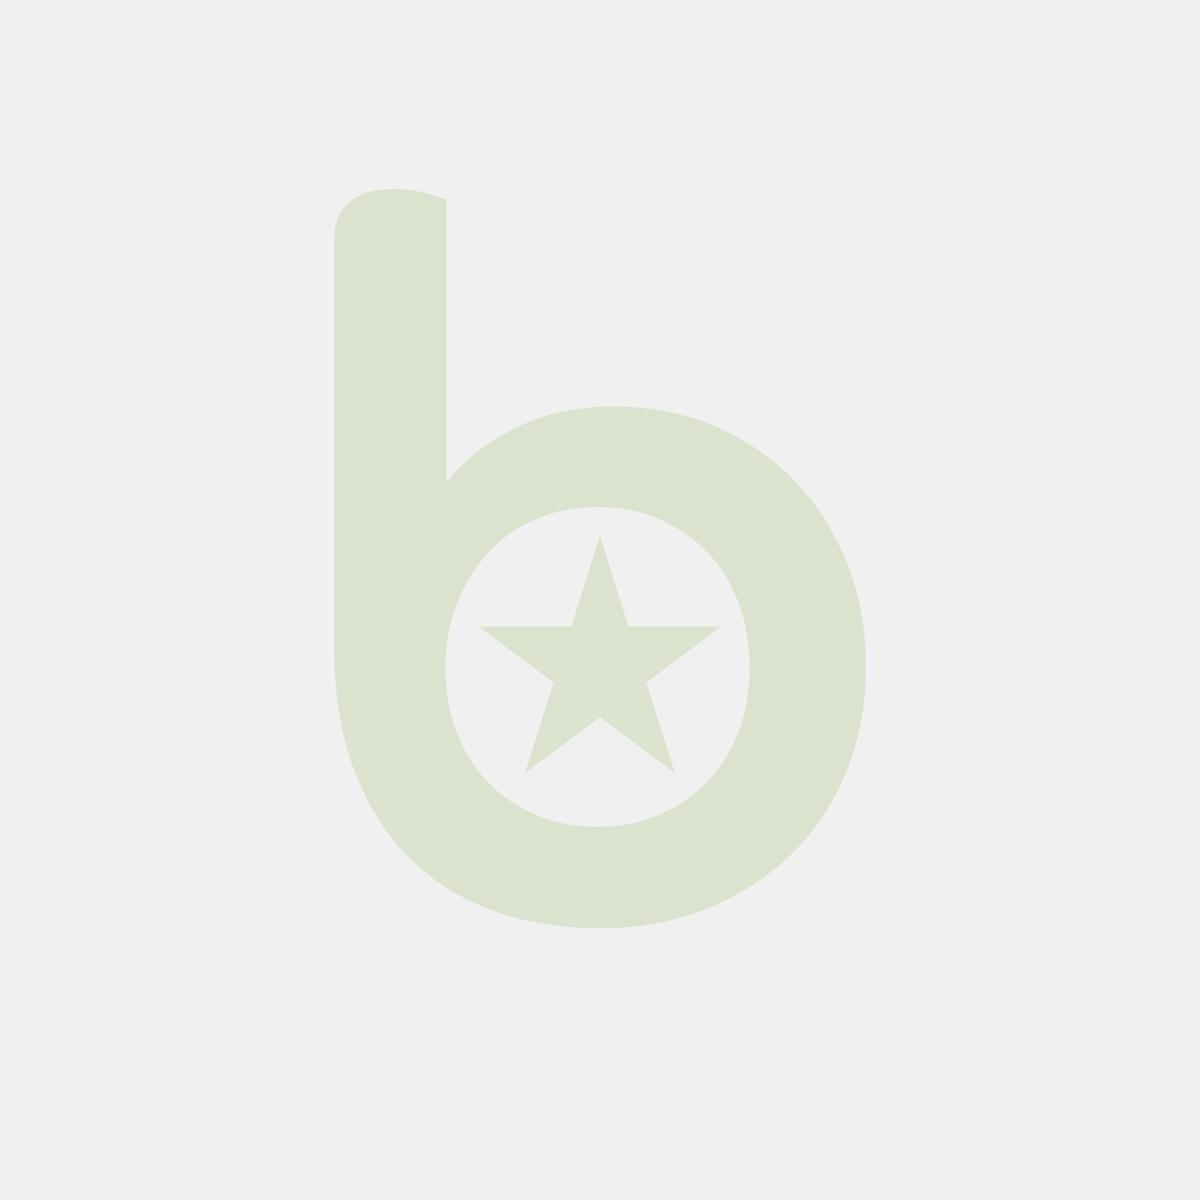 Kapelusz - melonik z brokatem srebrny